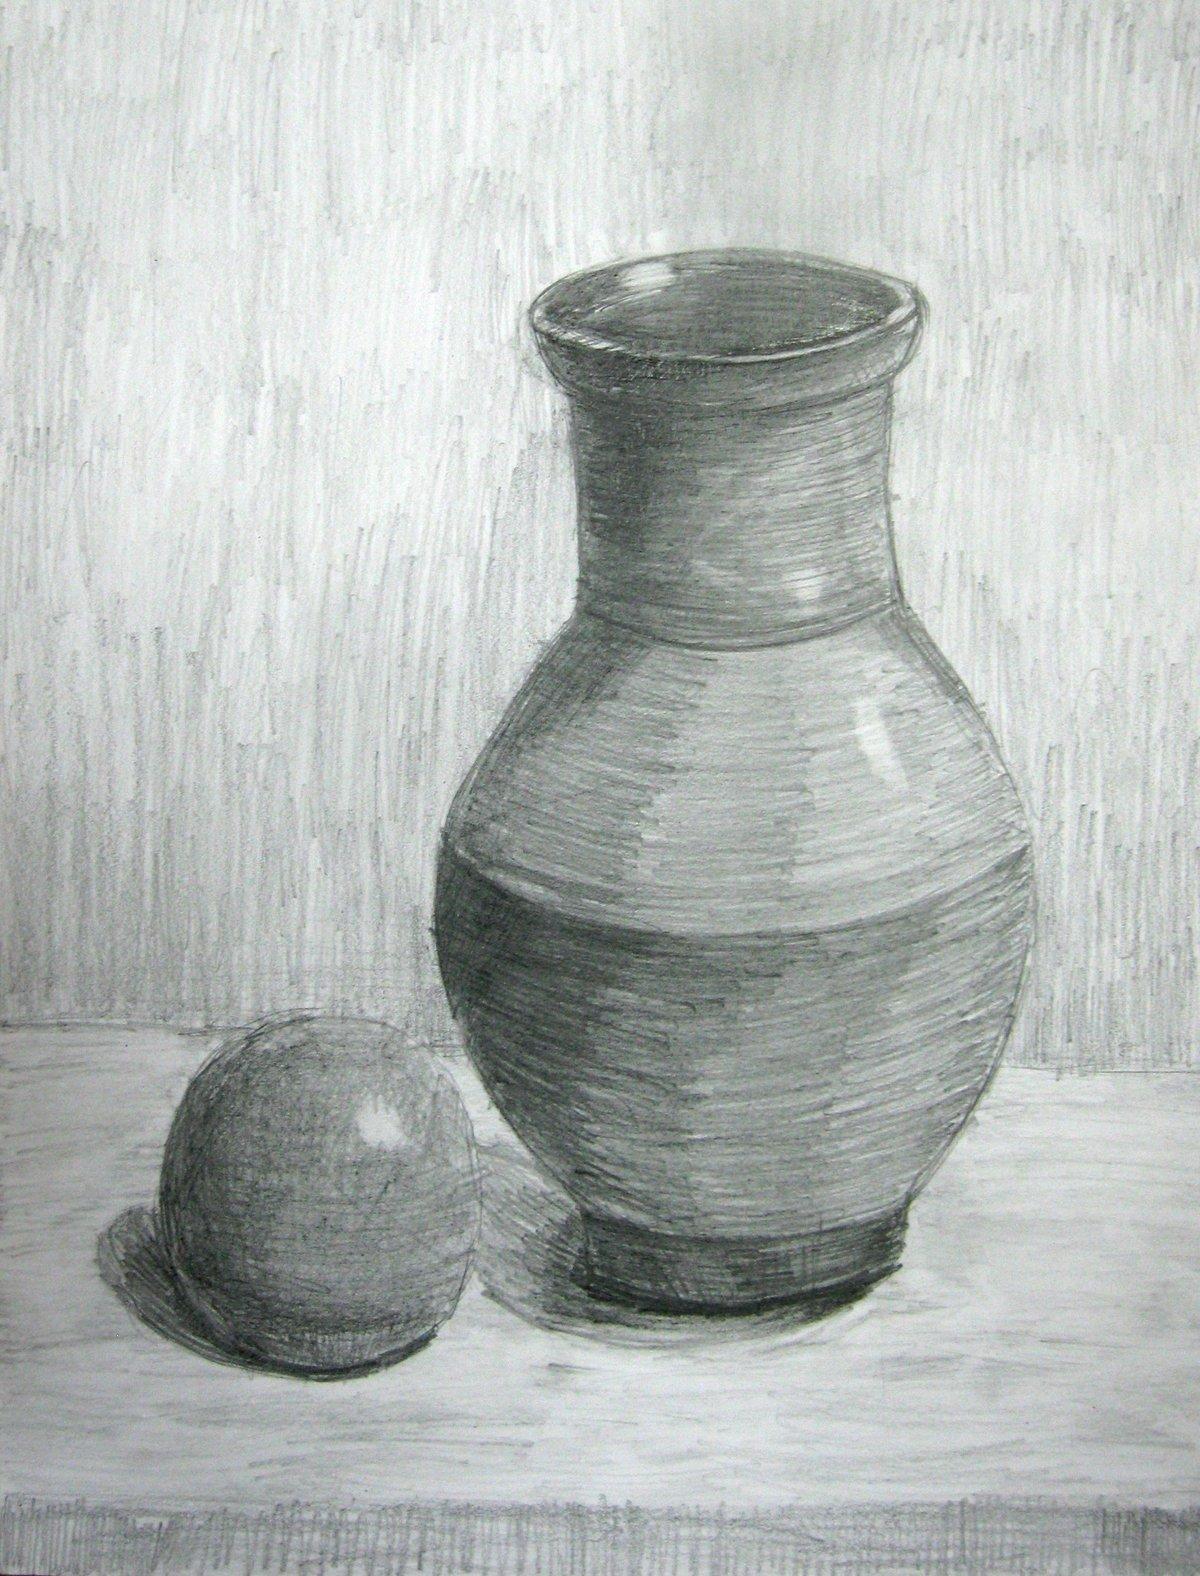 картинки ваза с тенями нашей компании